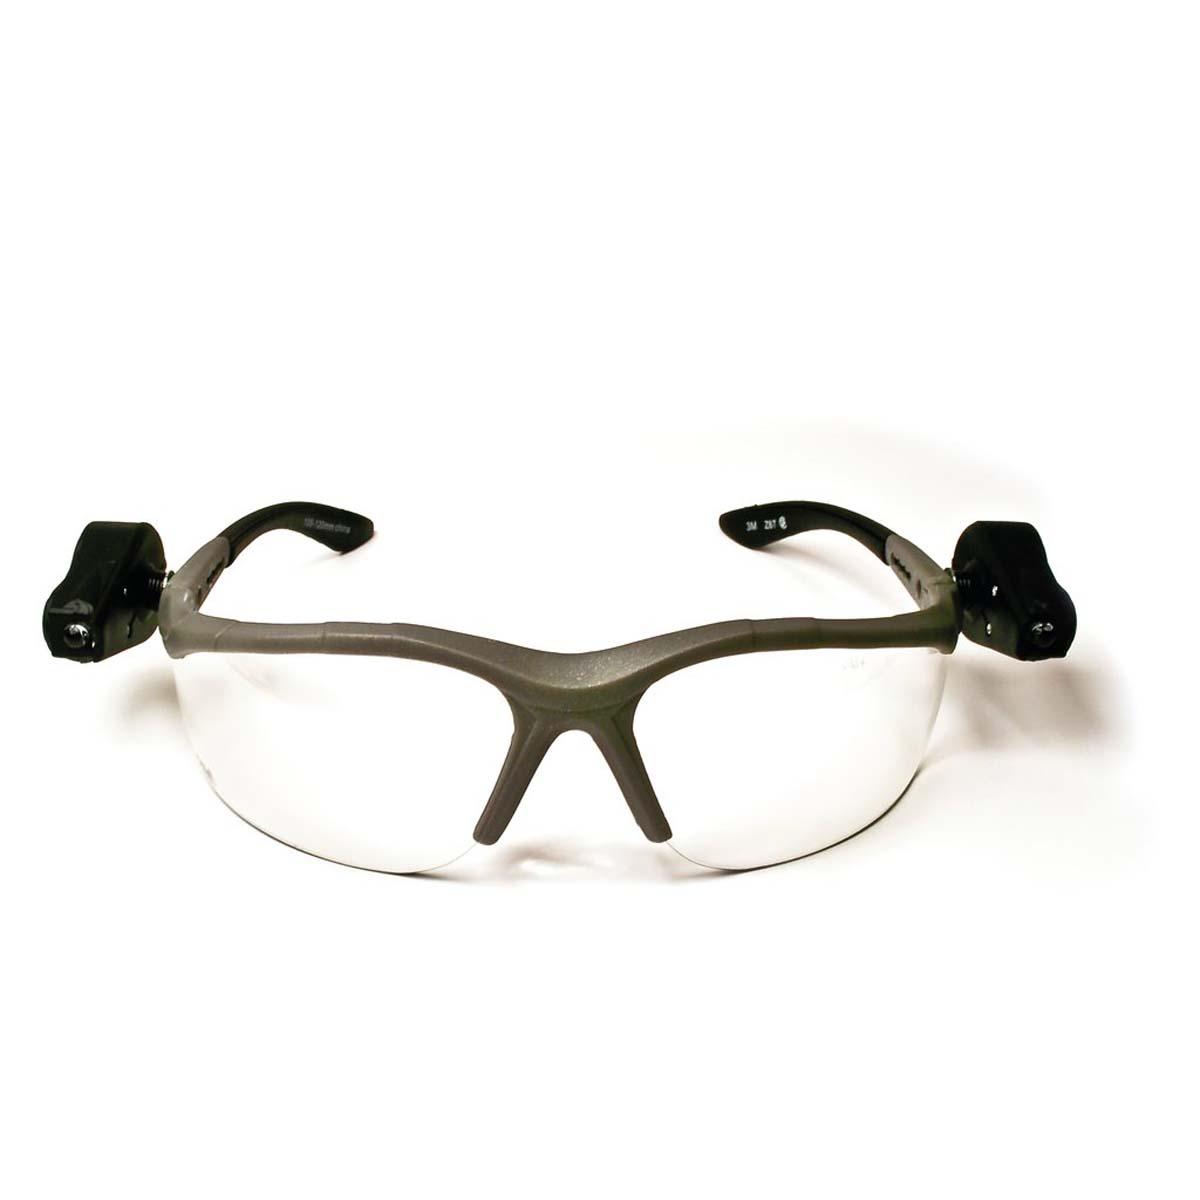 "3Mâ""¢ Light Visionâ""¢ 2 Protective Eyewear 11476-00000-10 Clear Anti-Fog Lens, Gray Frame, Lights"